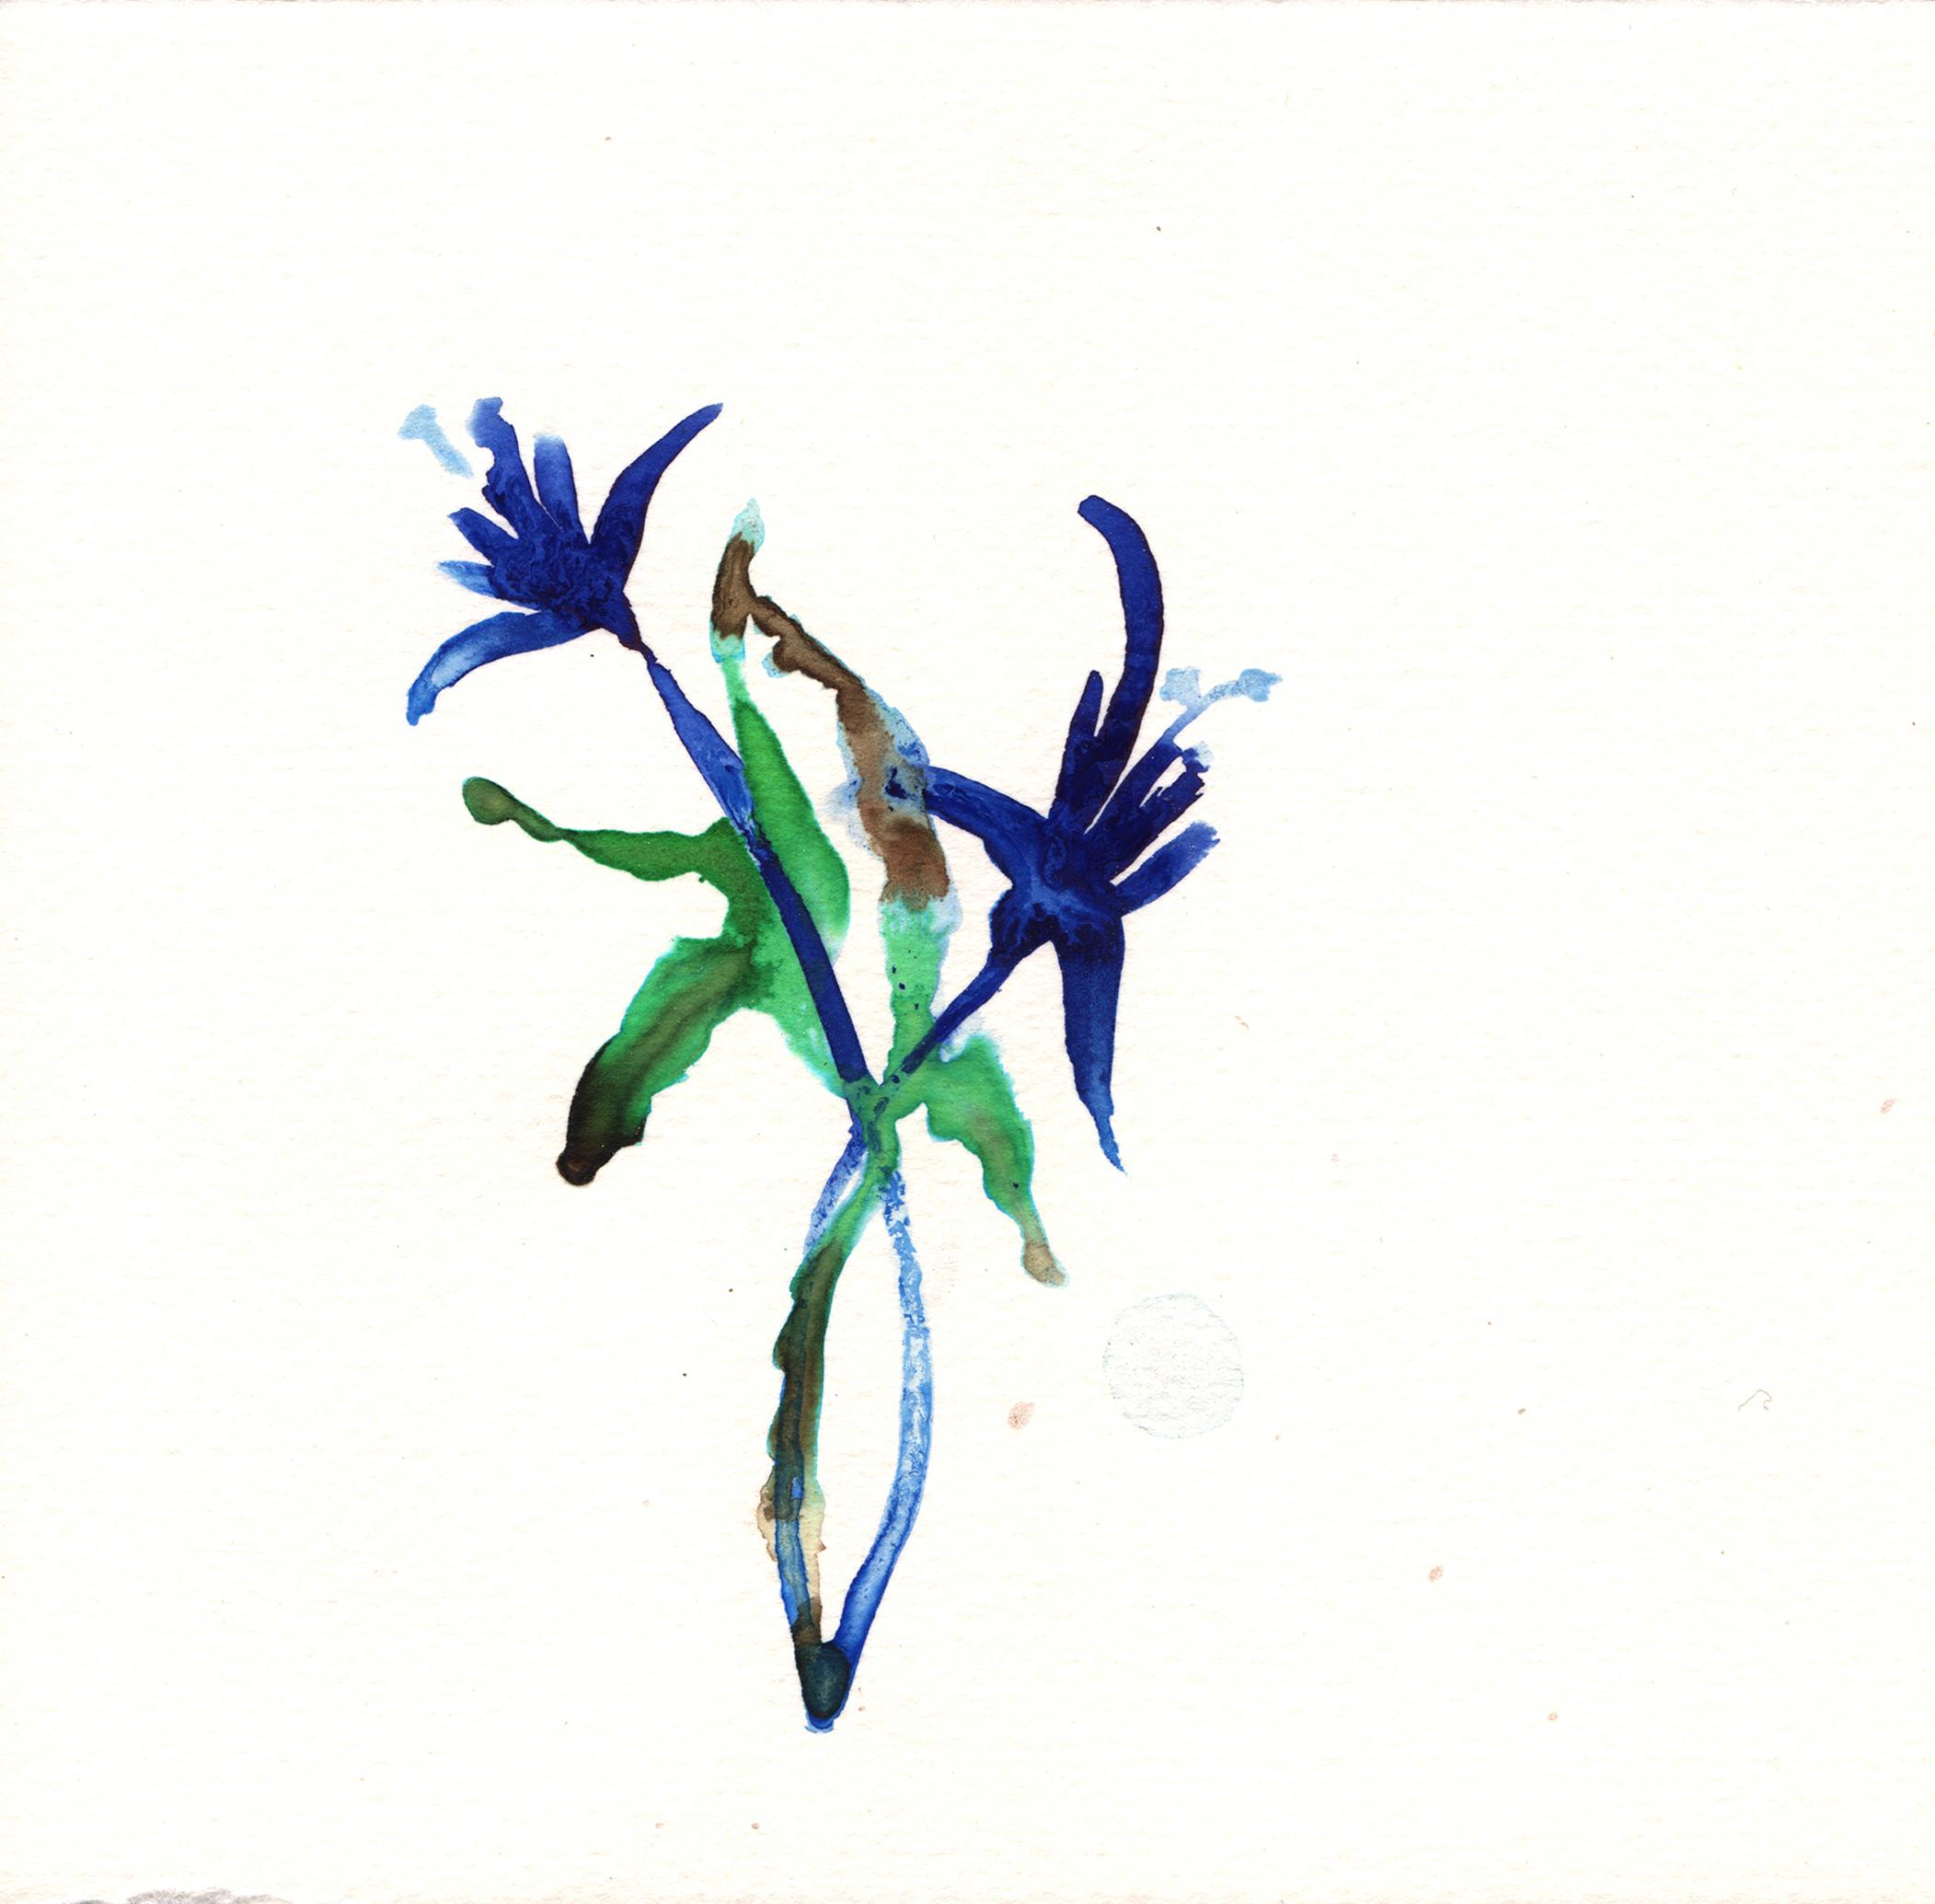 232.Daffodil.9.28.14.jpg